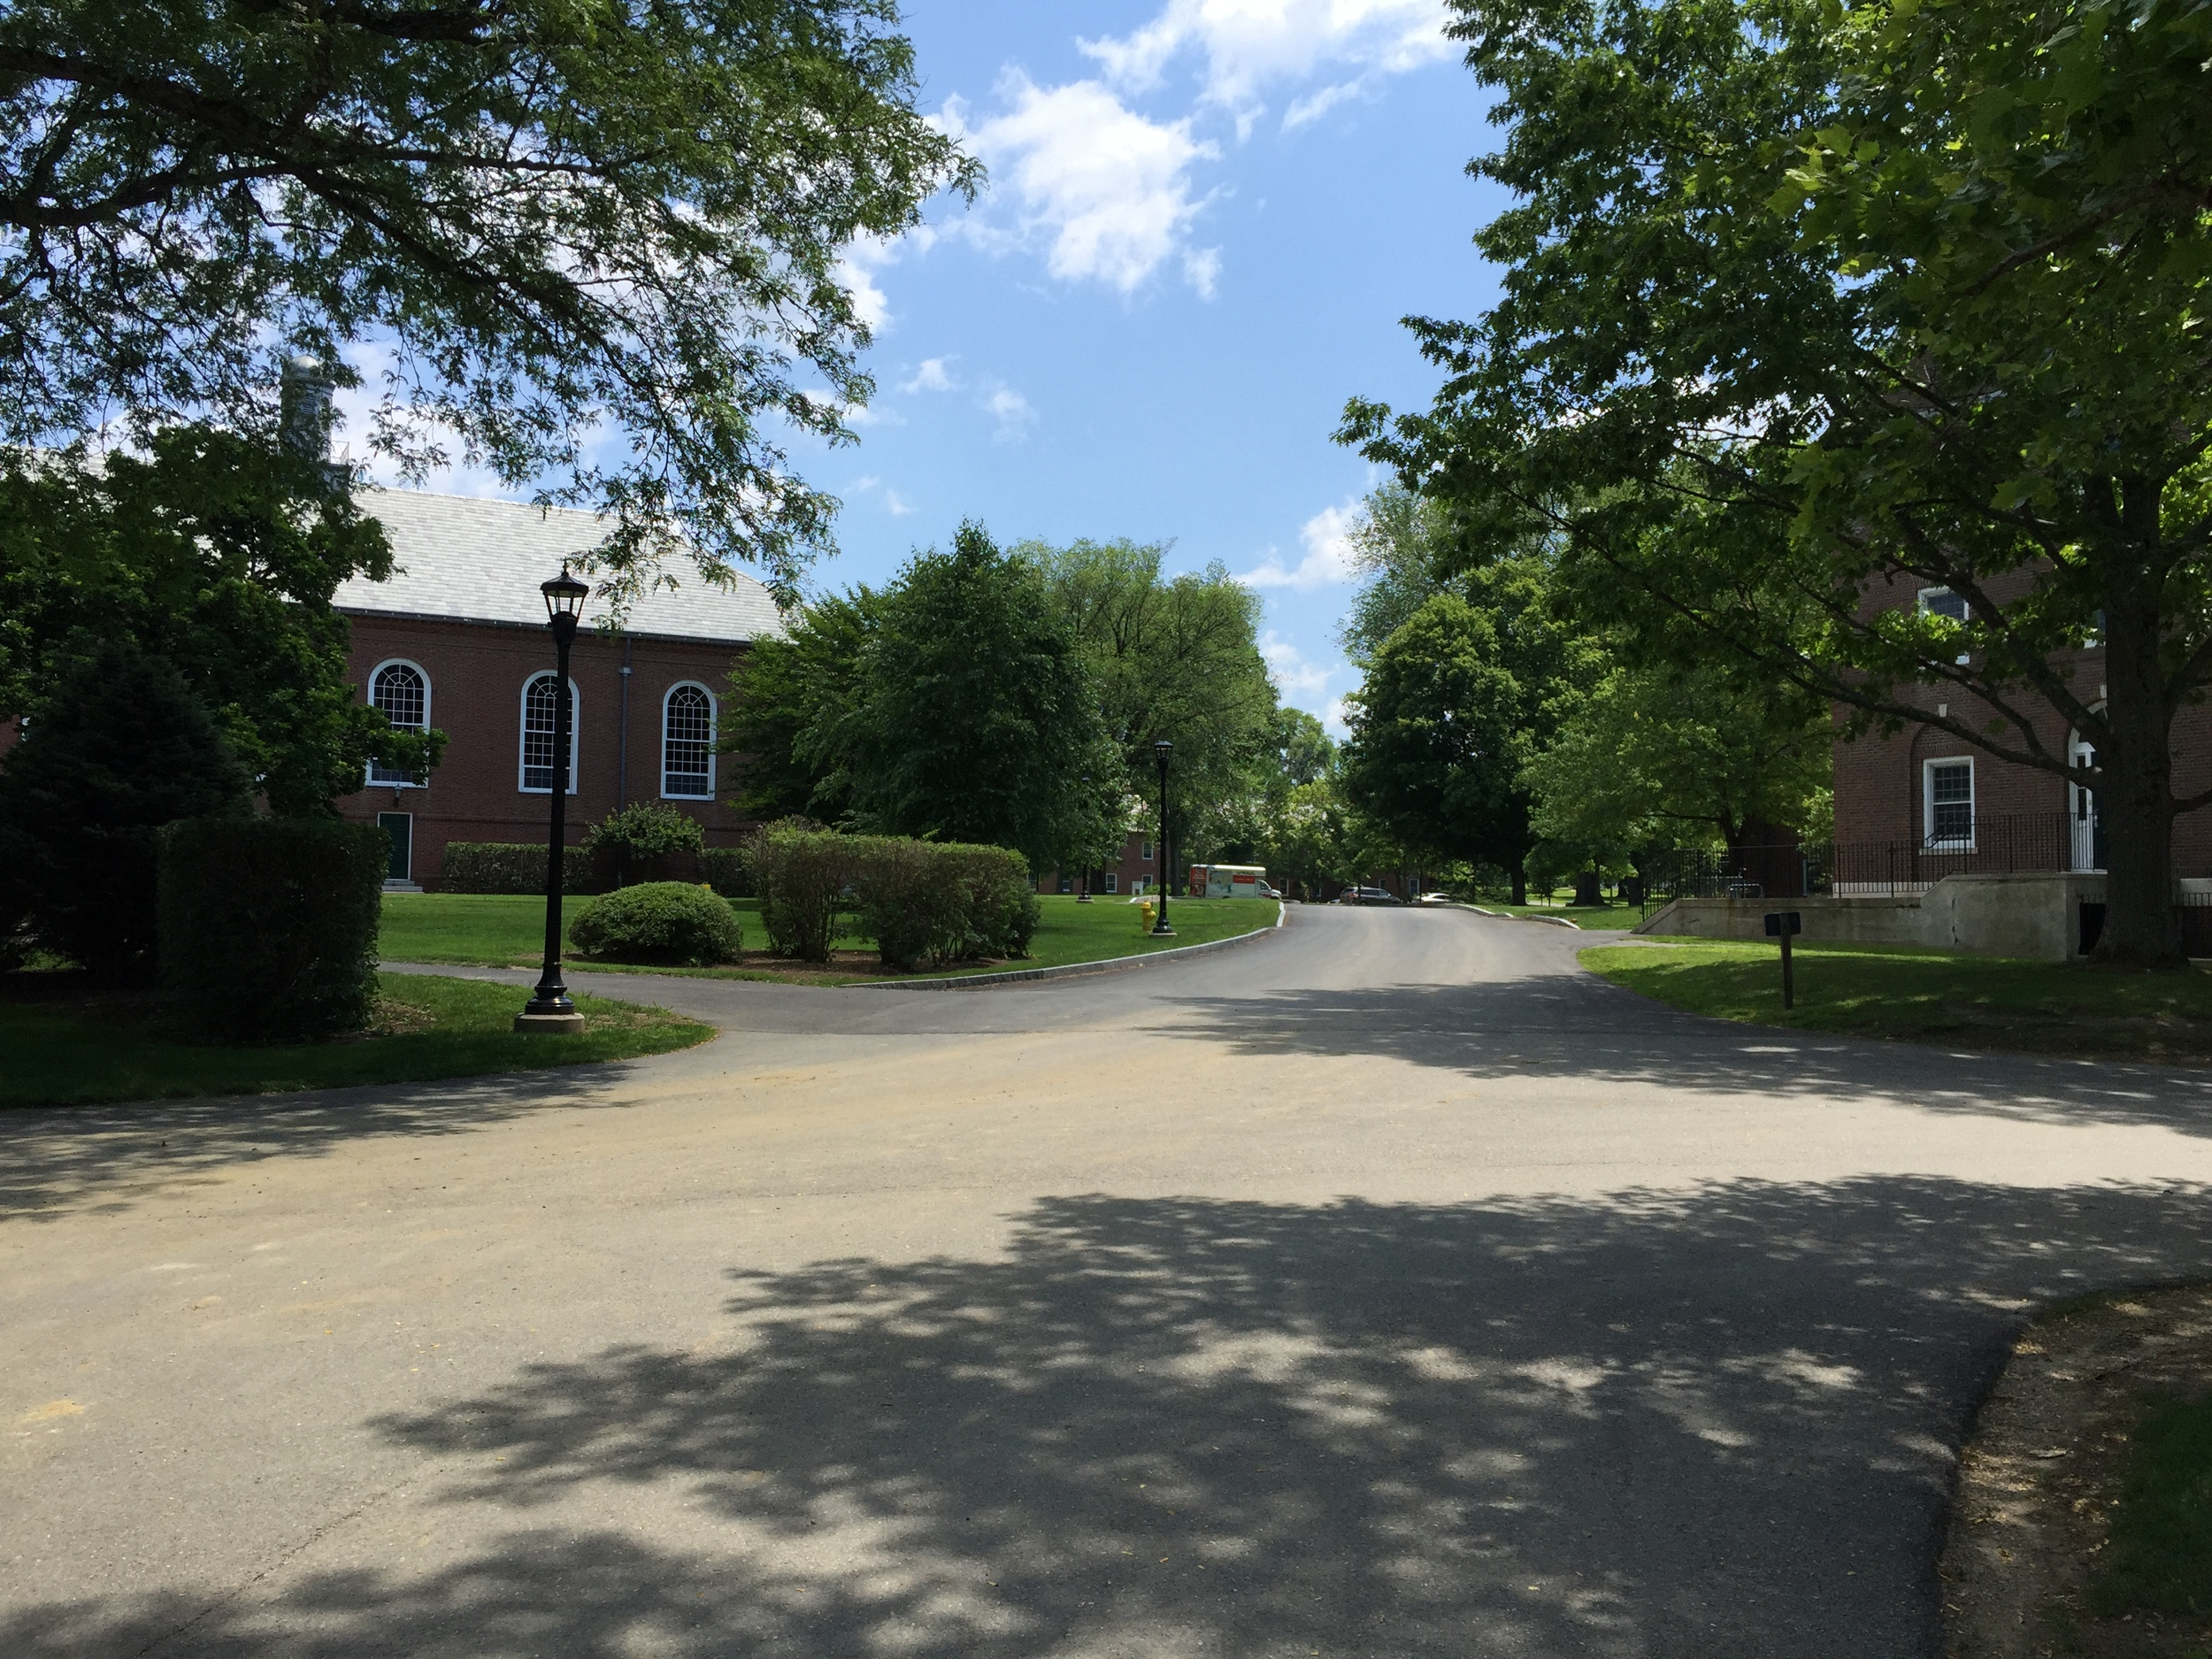 Hotchkiss campus